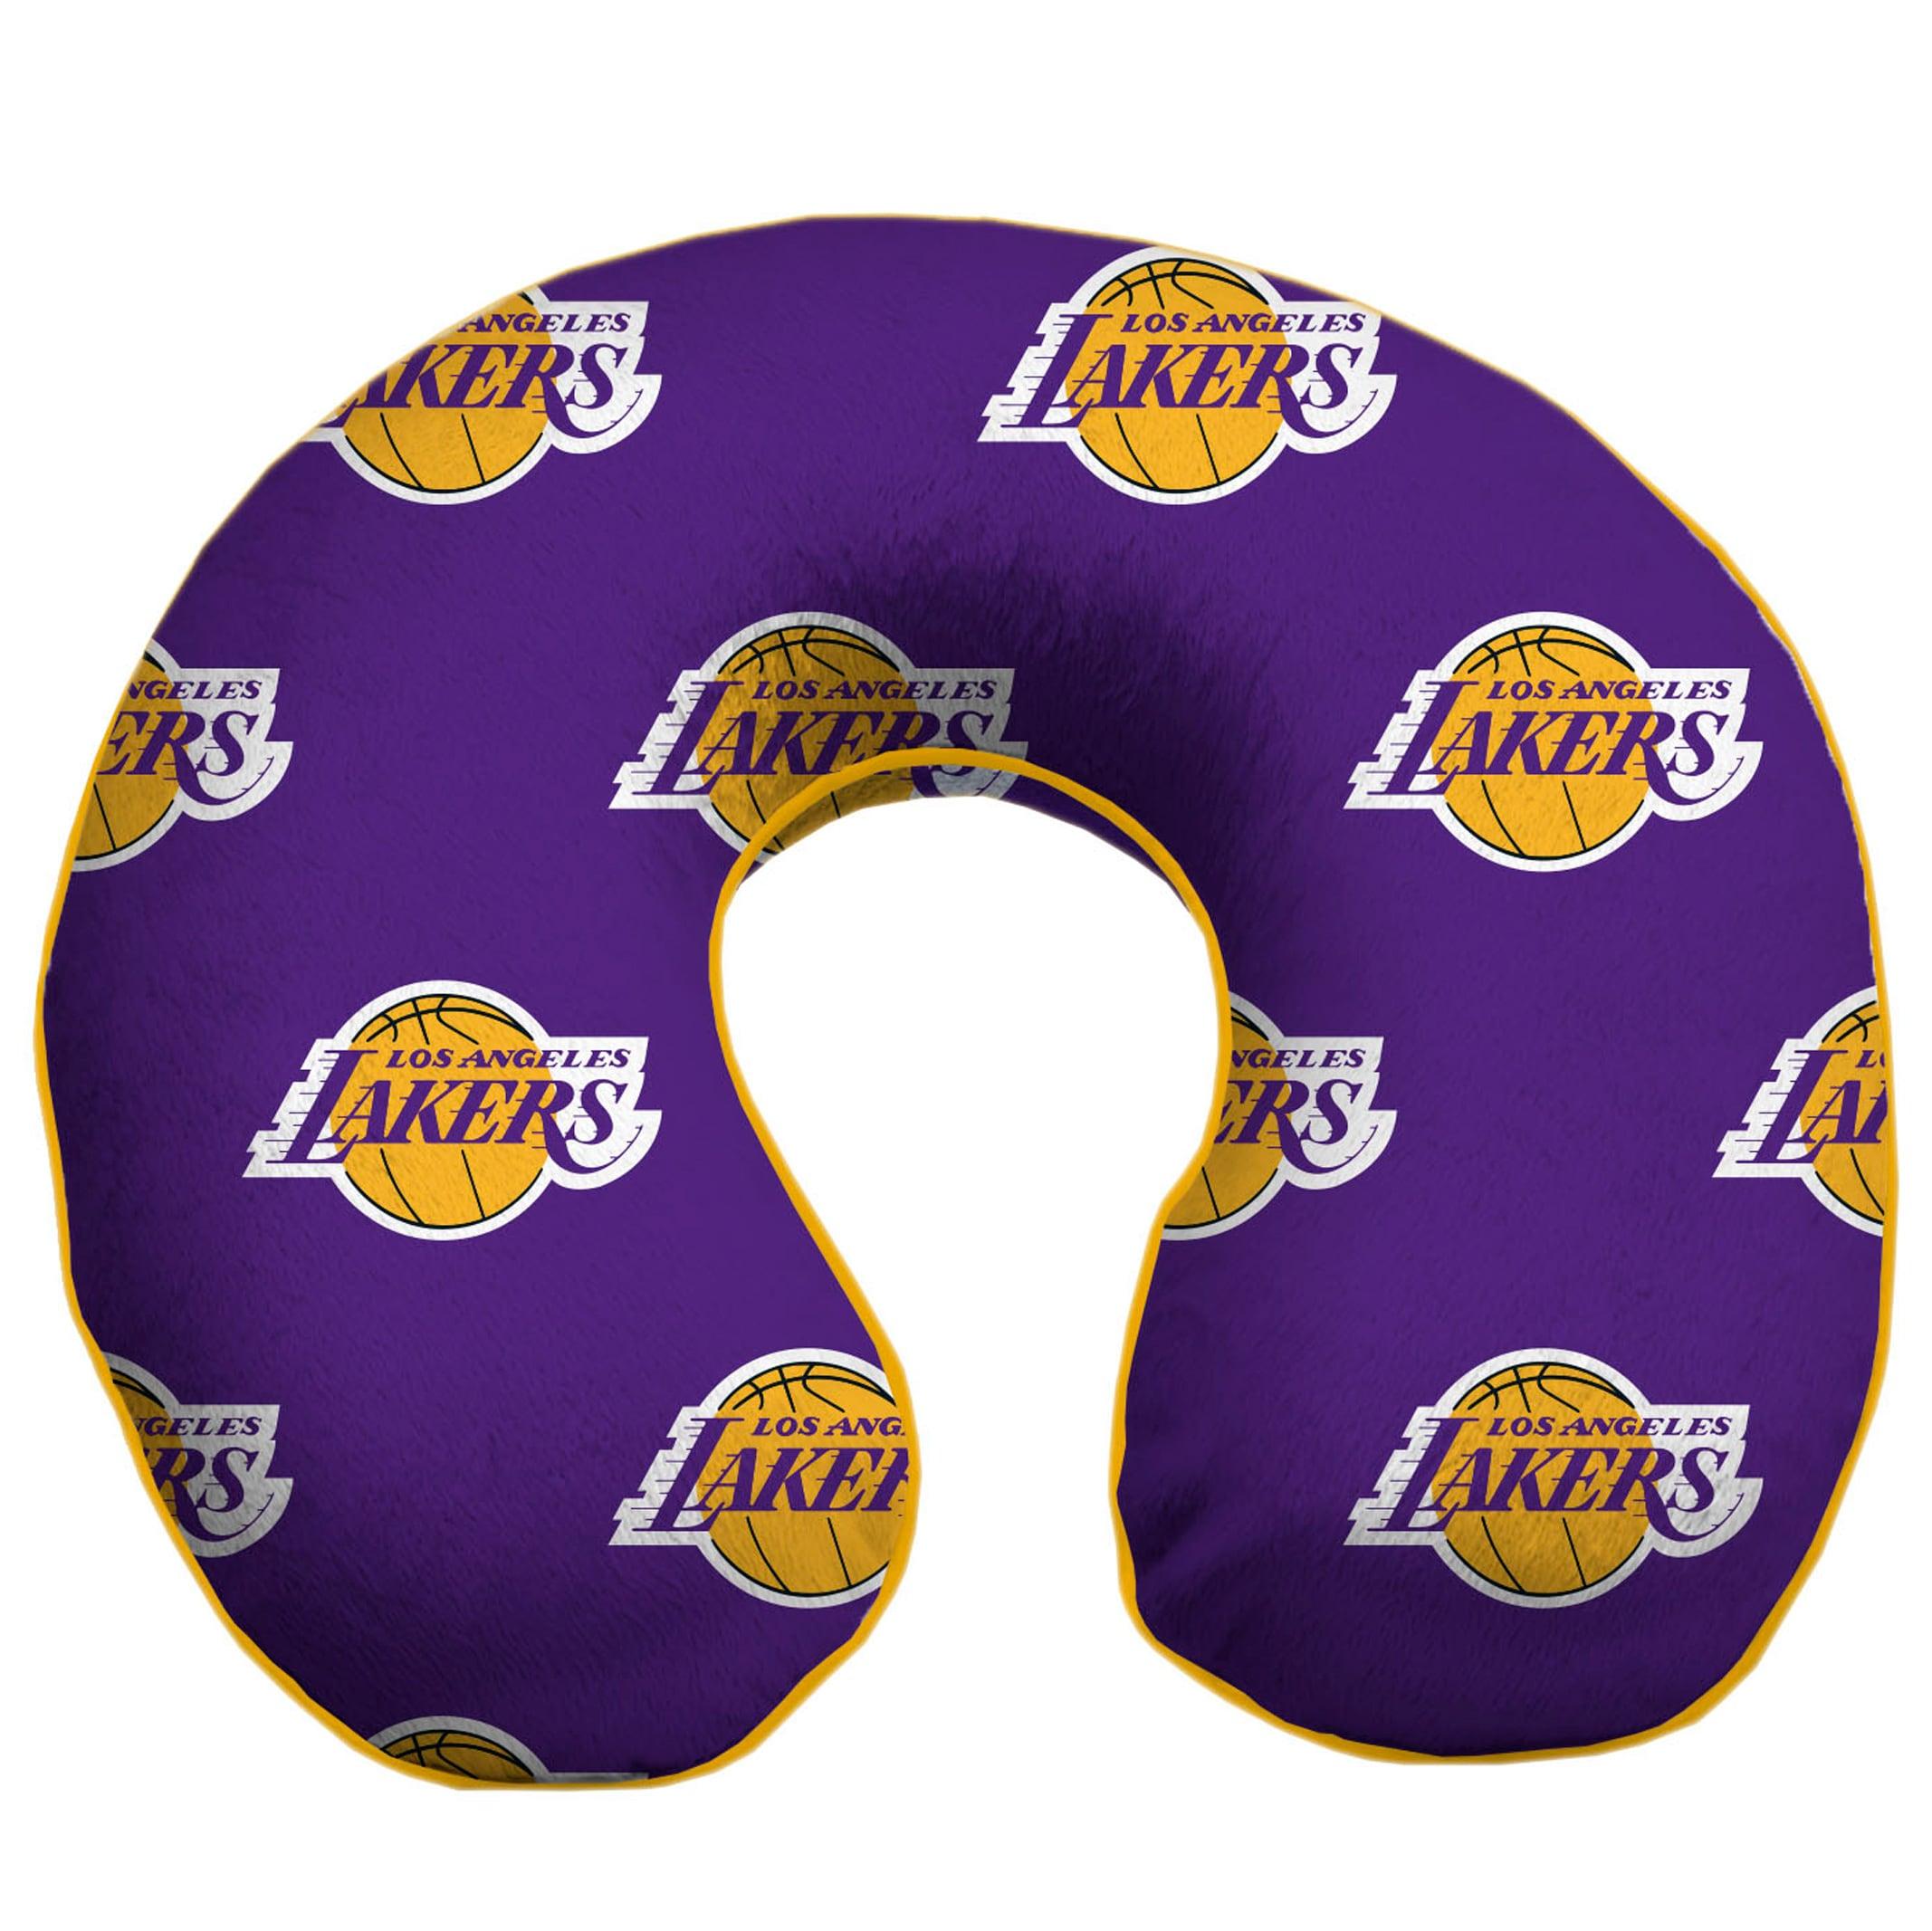 Los Angeles Lakers Travel Memory Foam Pillow